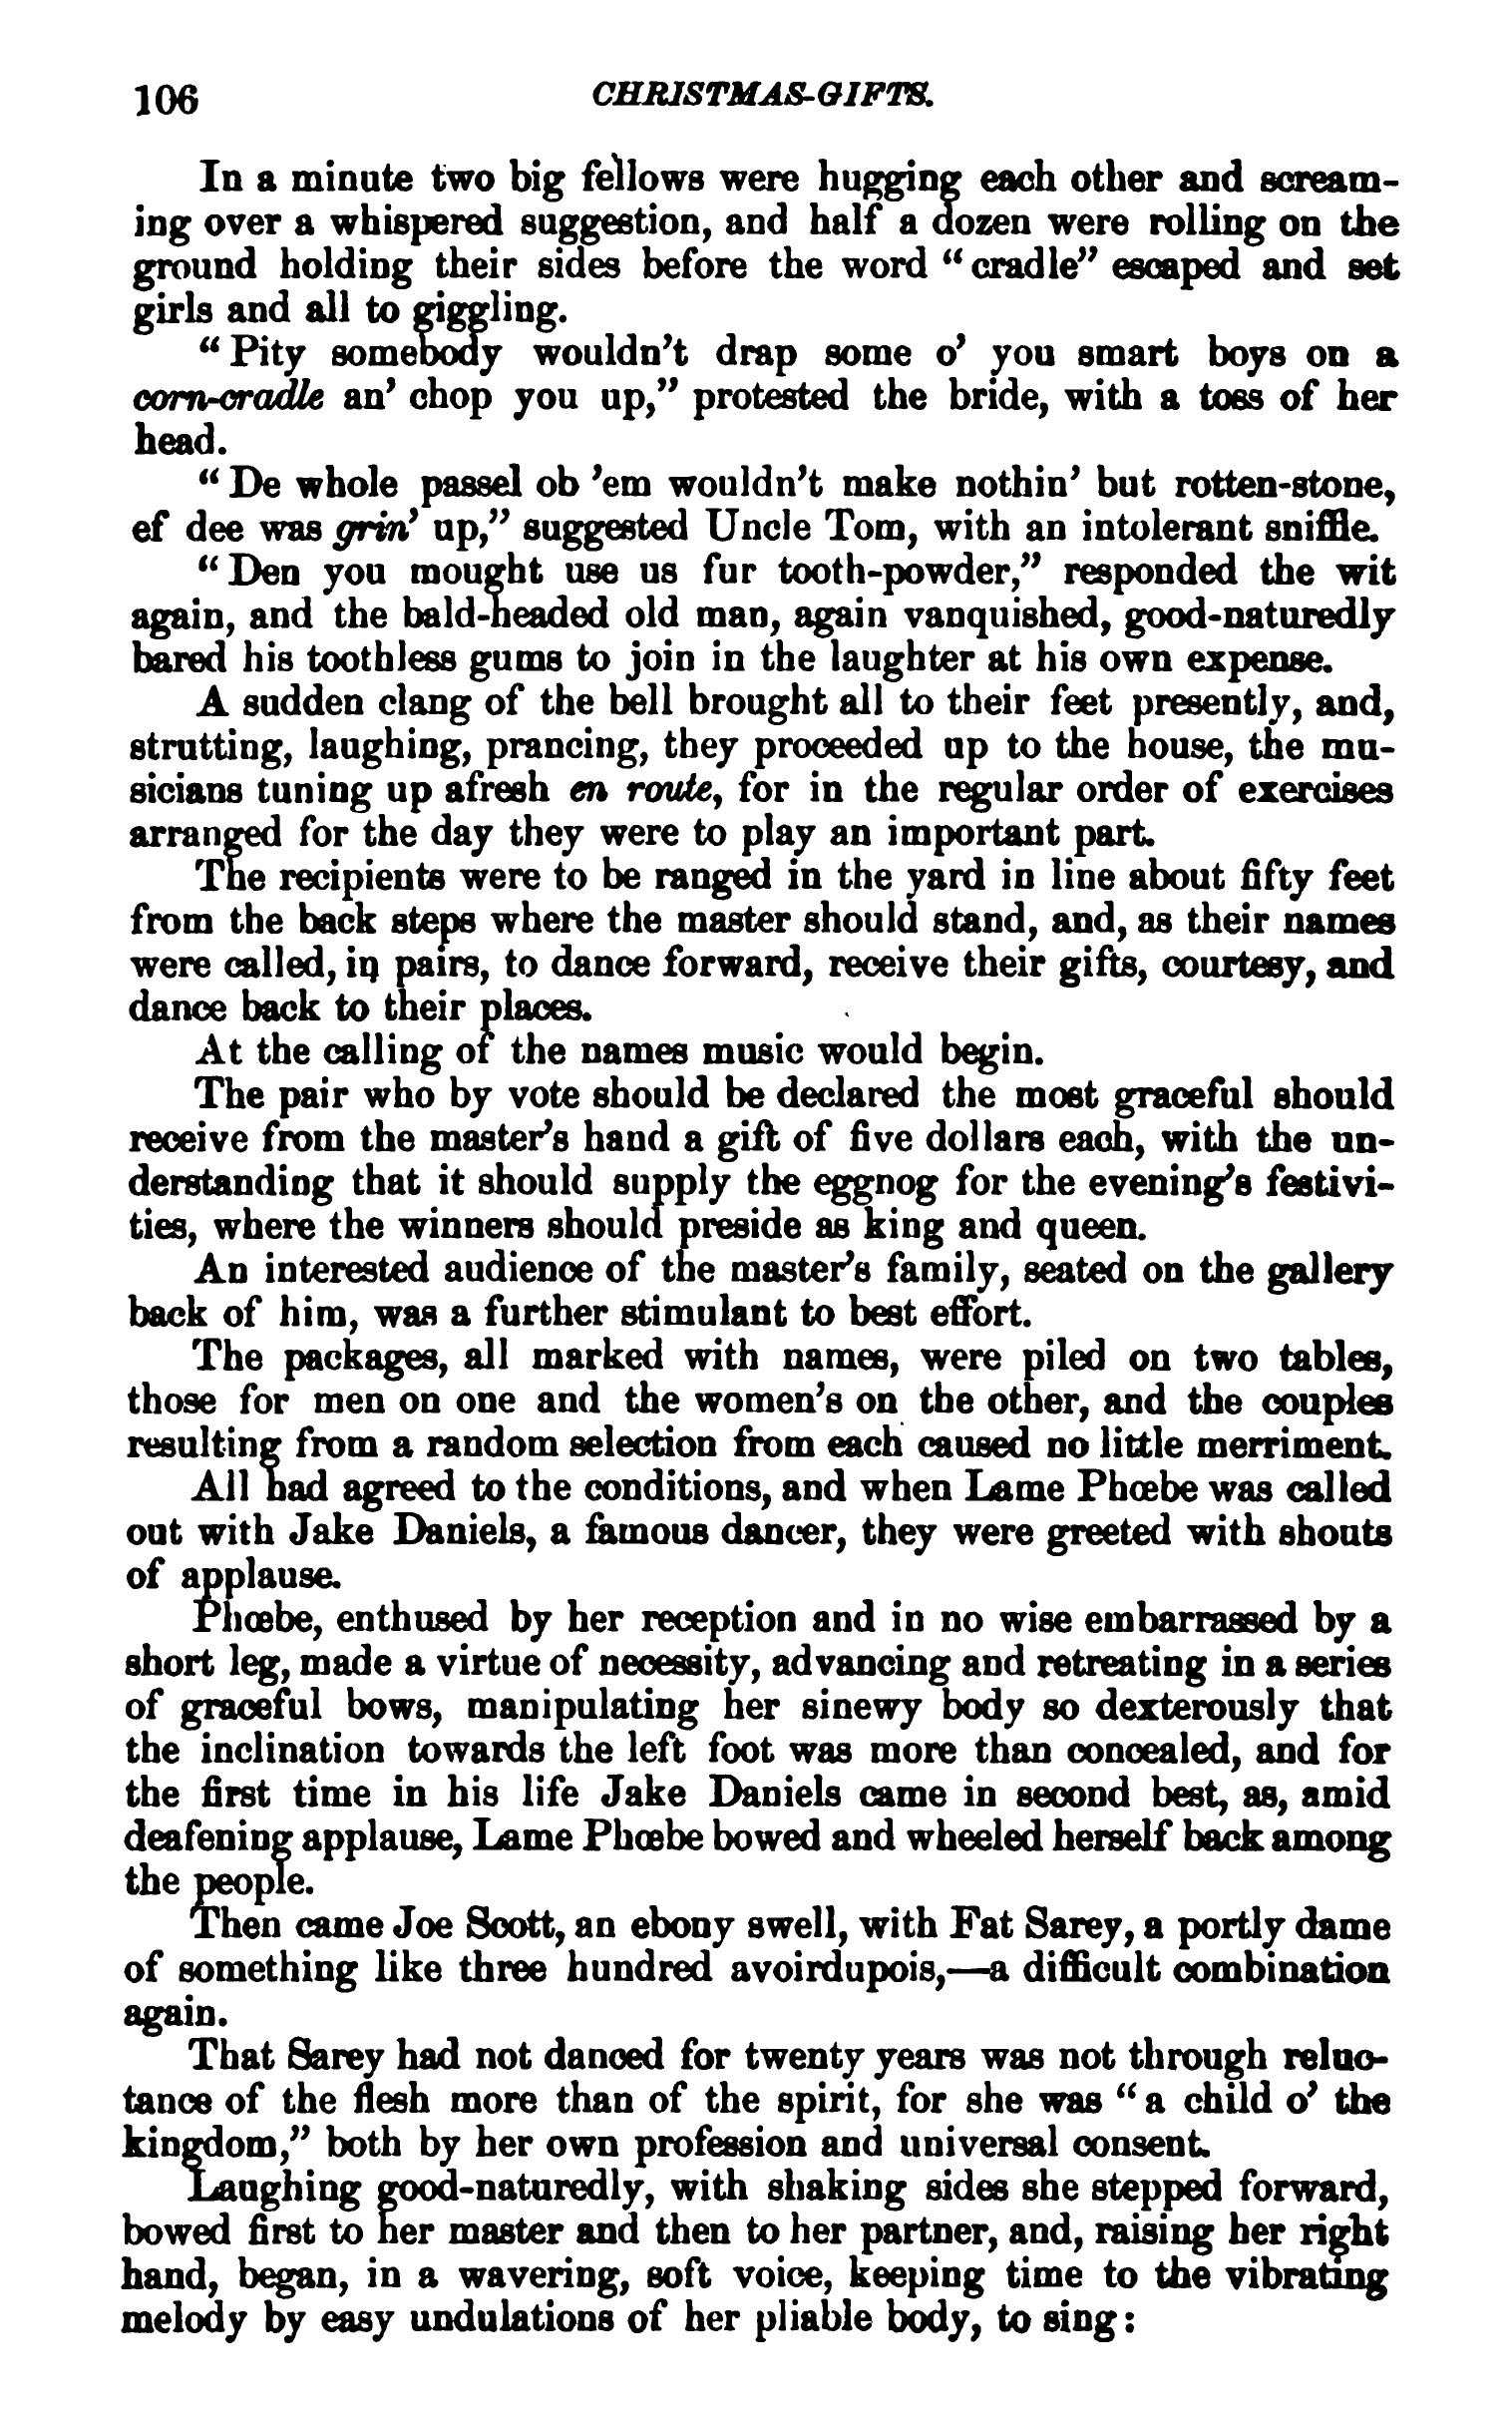 Lippincotts_Monthly_Magazine_1891_p107 119.jpg